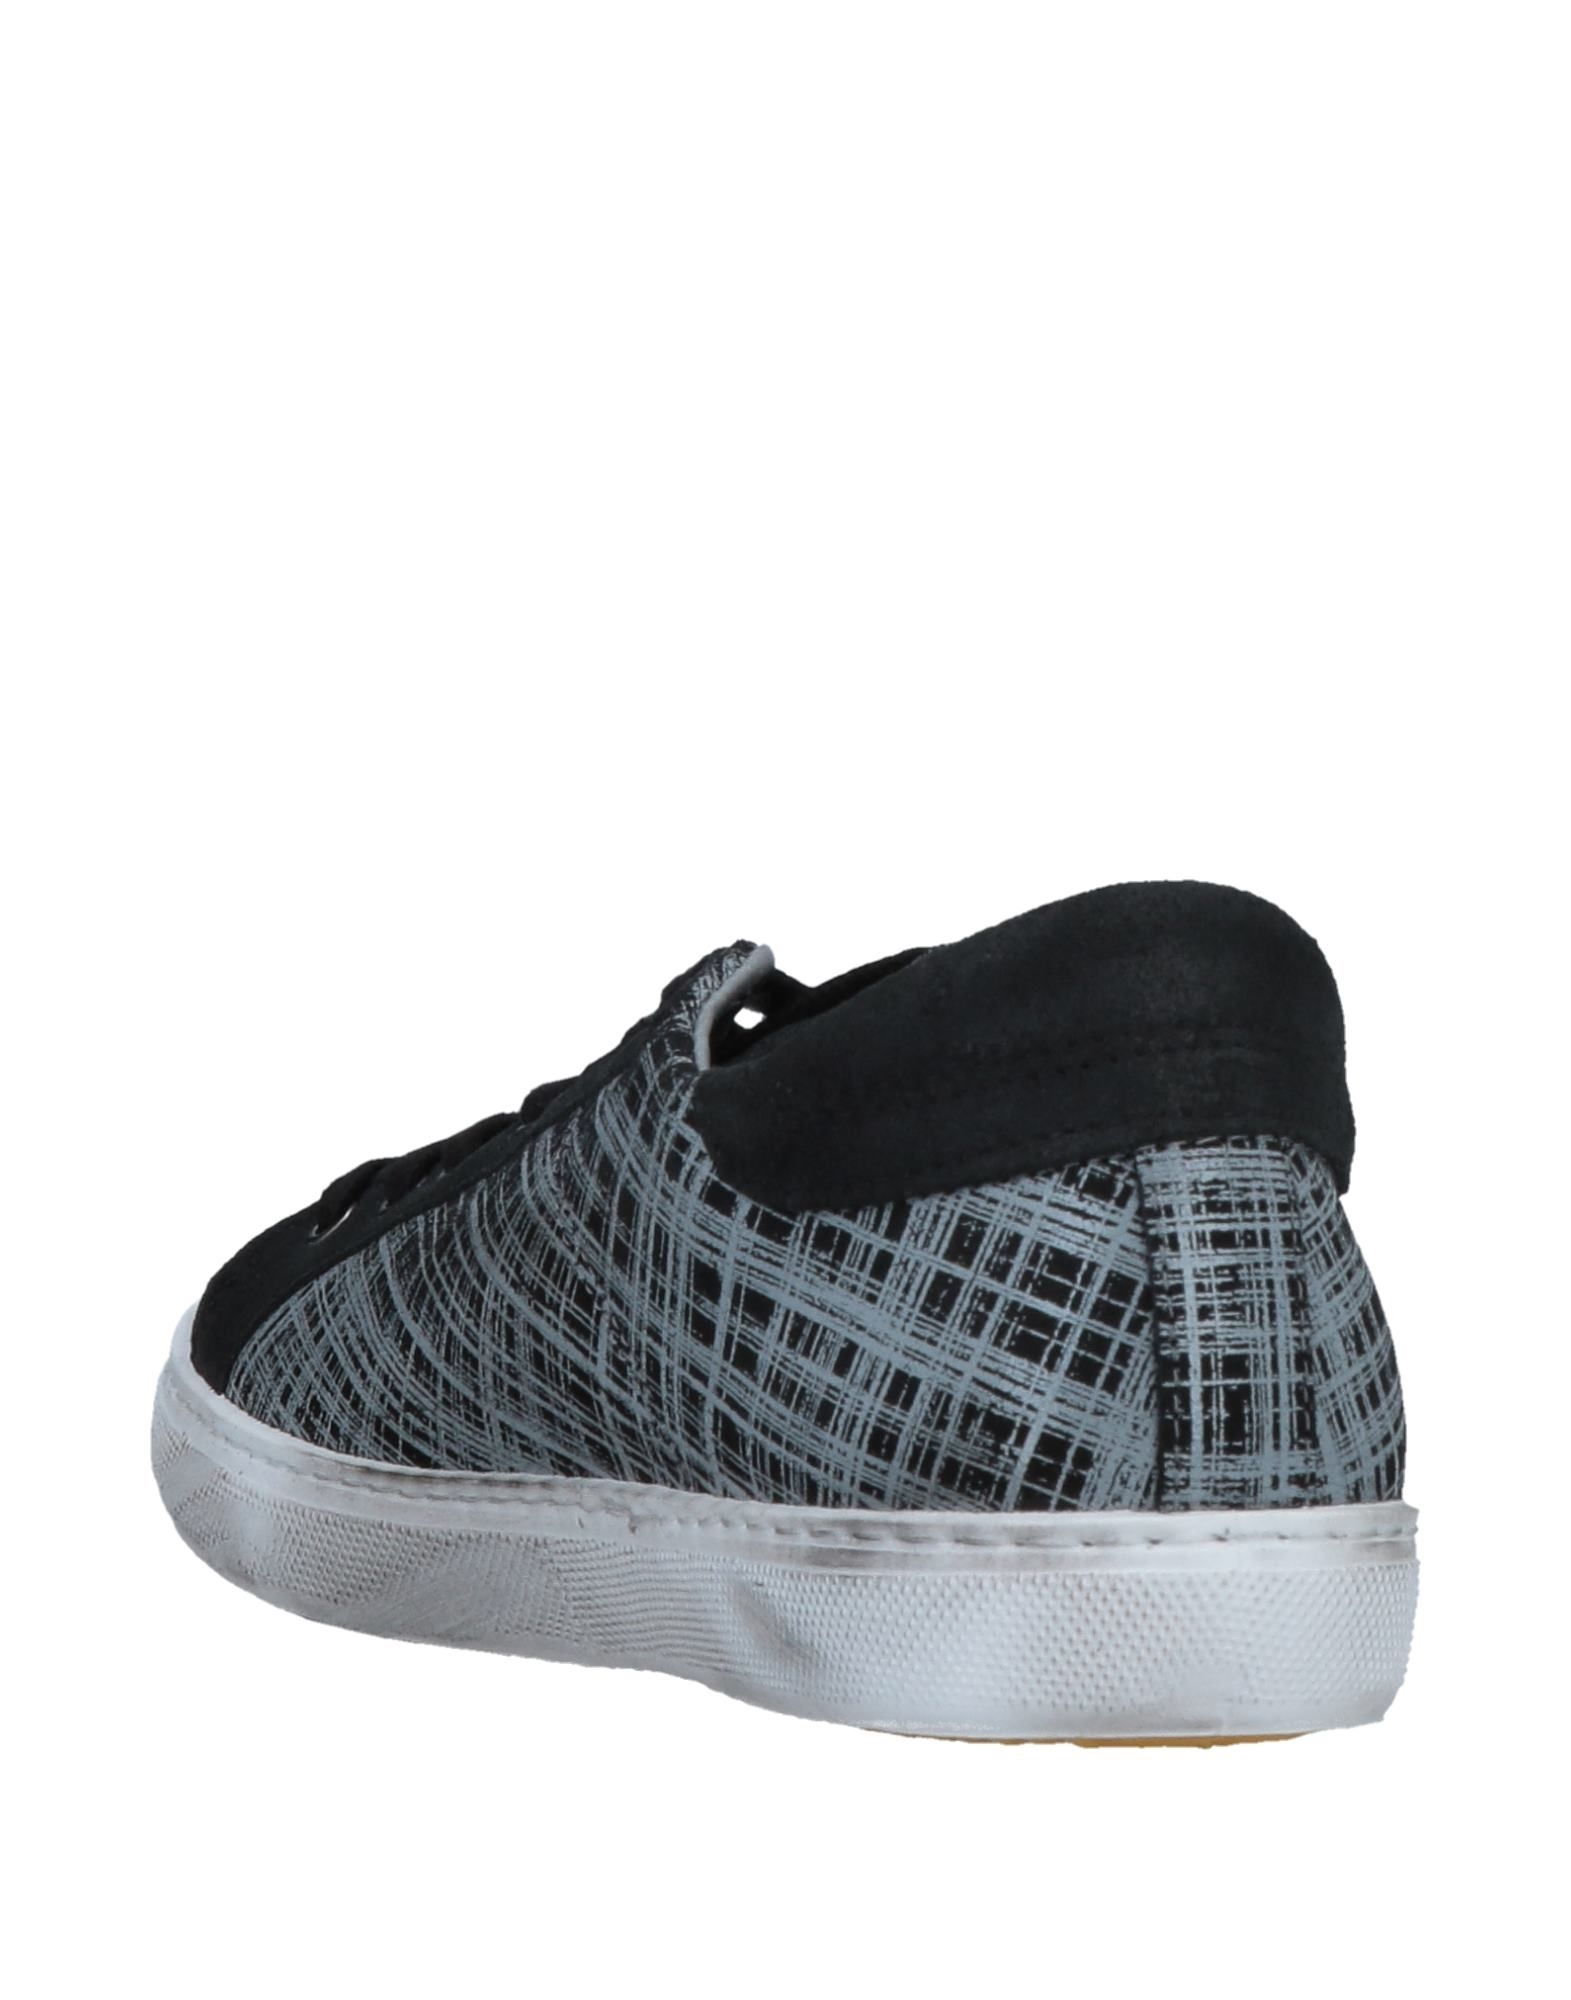 2Star 2Star  Sneakers Herren  11506228XQ 6a1e18